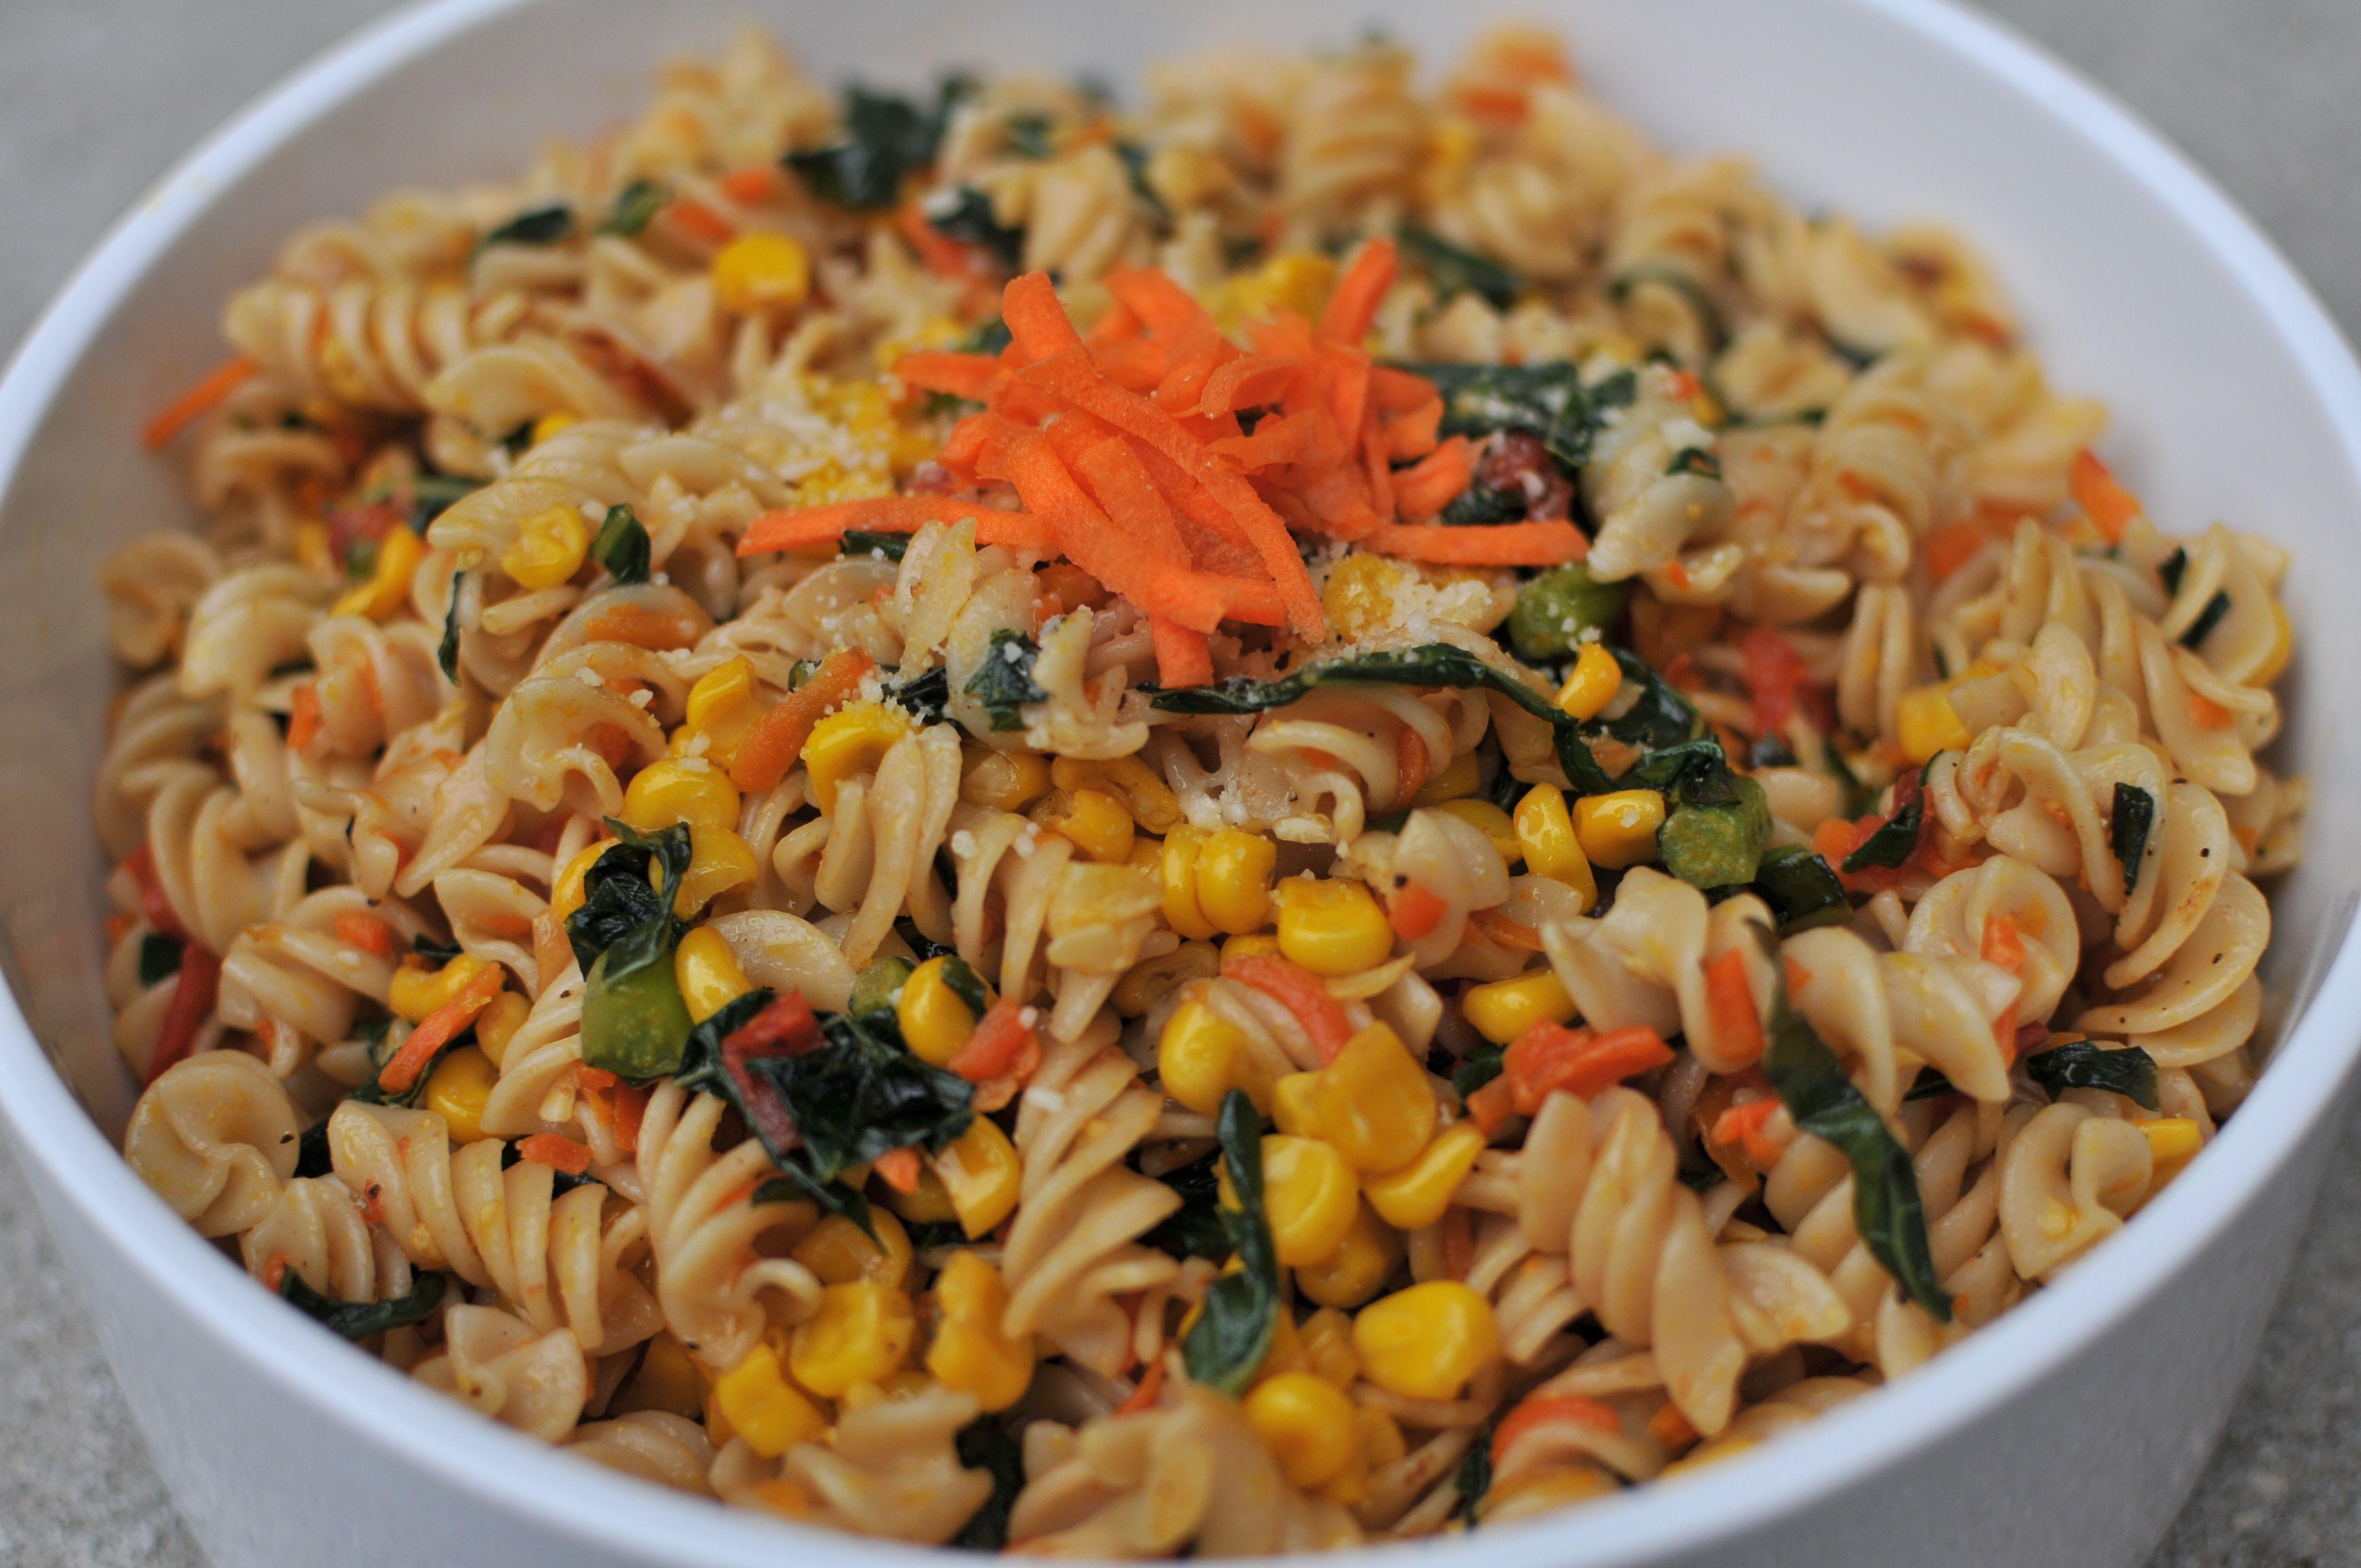 Brown Rice Pasta  BROWN RICE PASTA WITH A RAINBOW OF VEGGIES